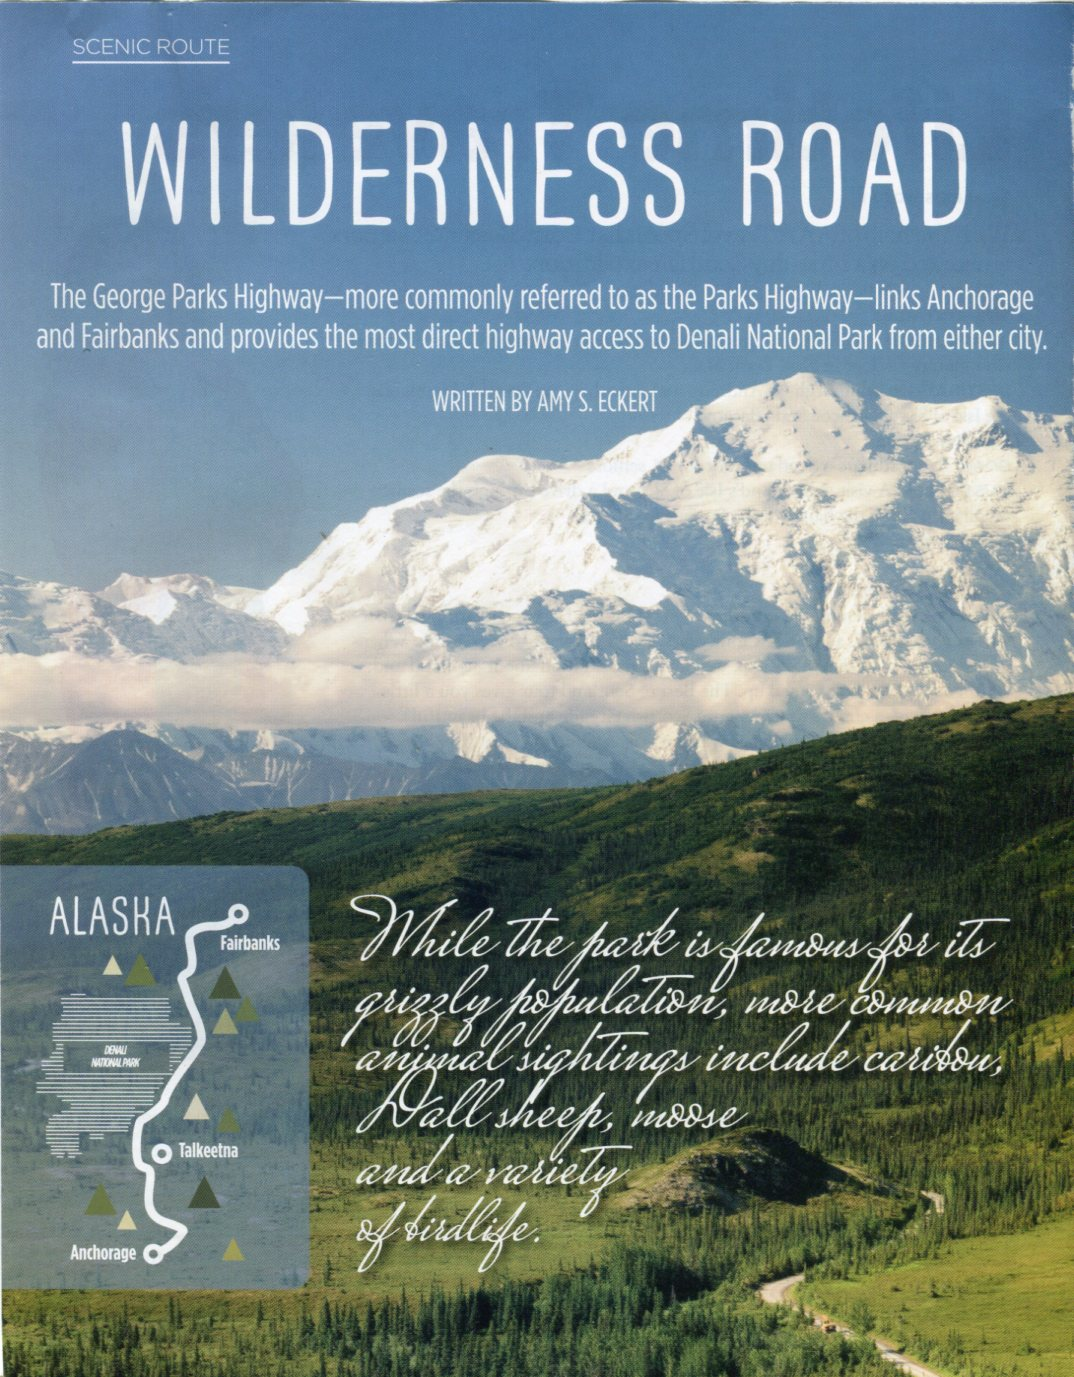 Alaska Wilderness Road001